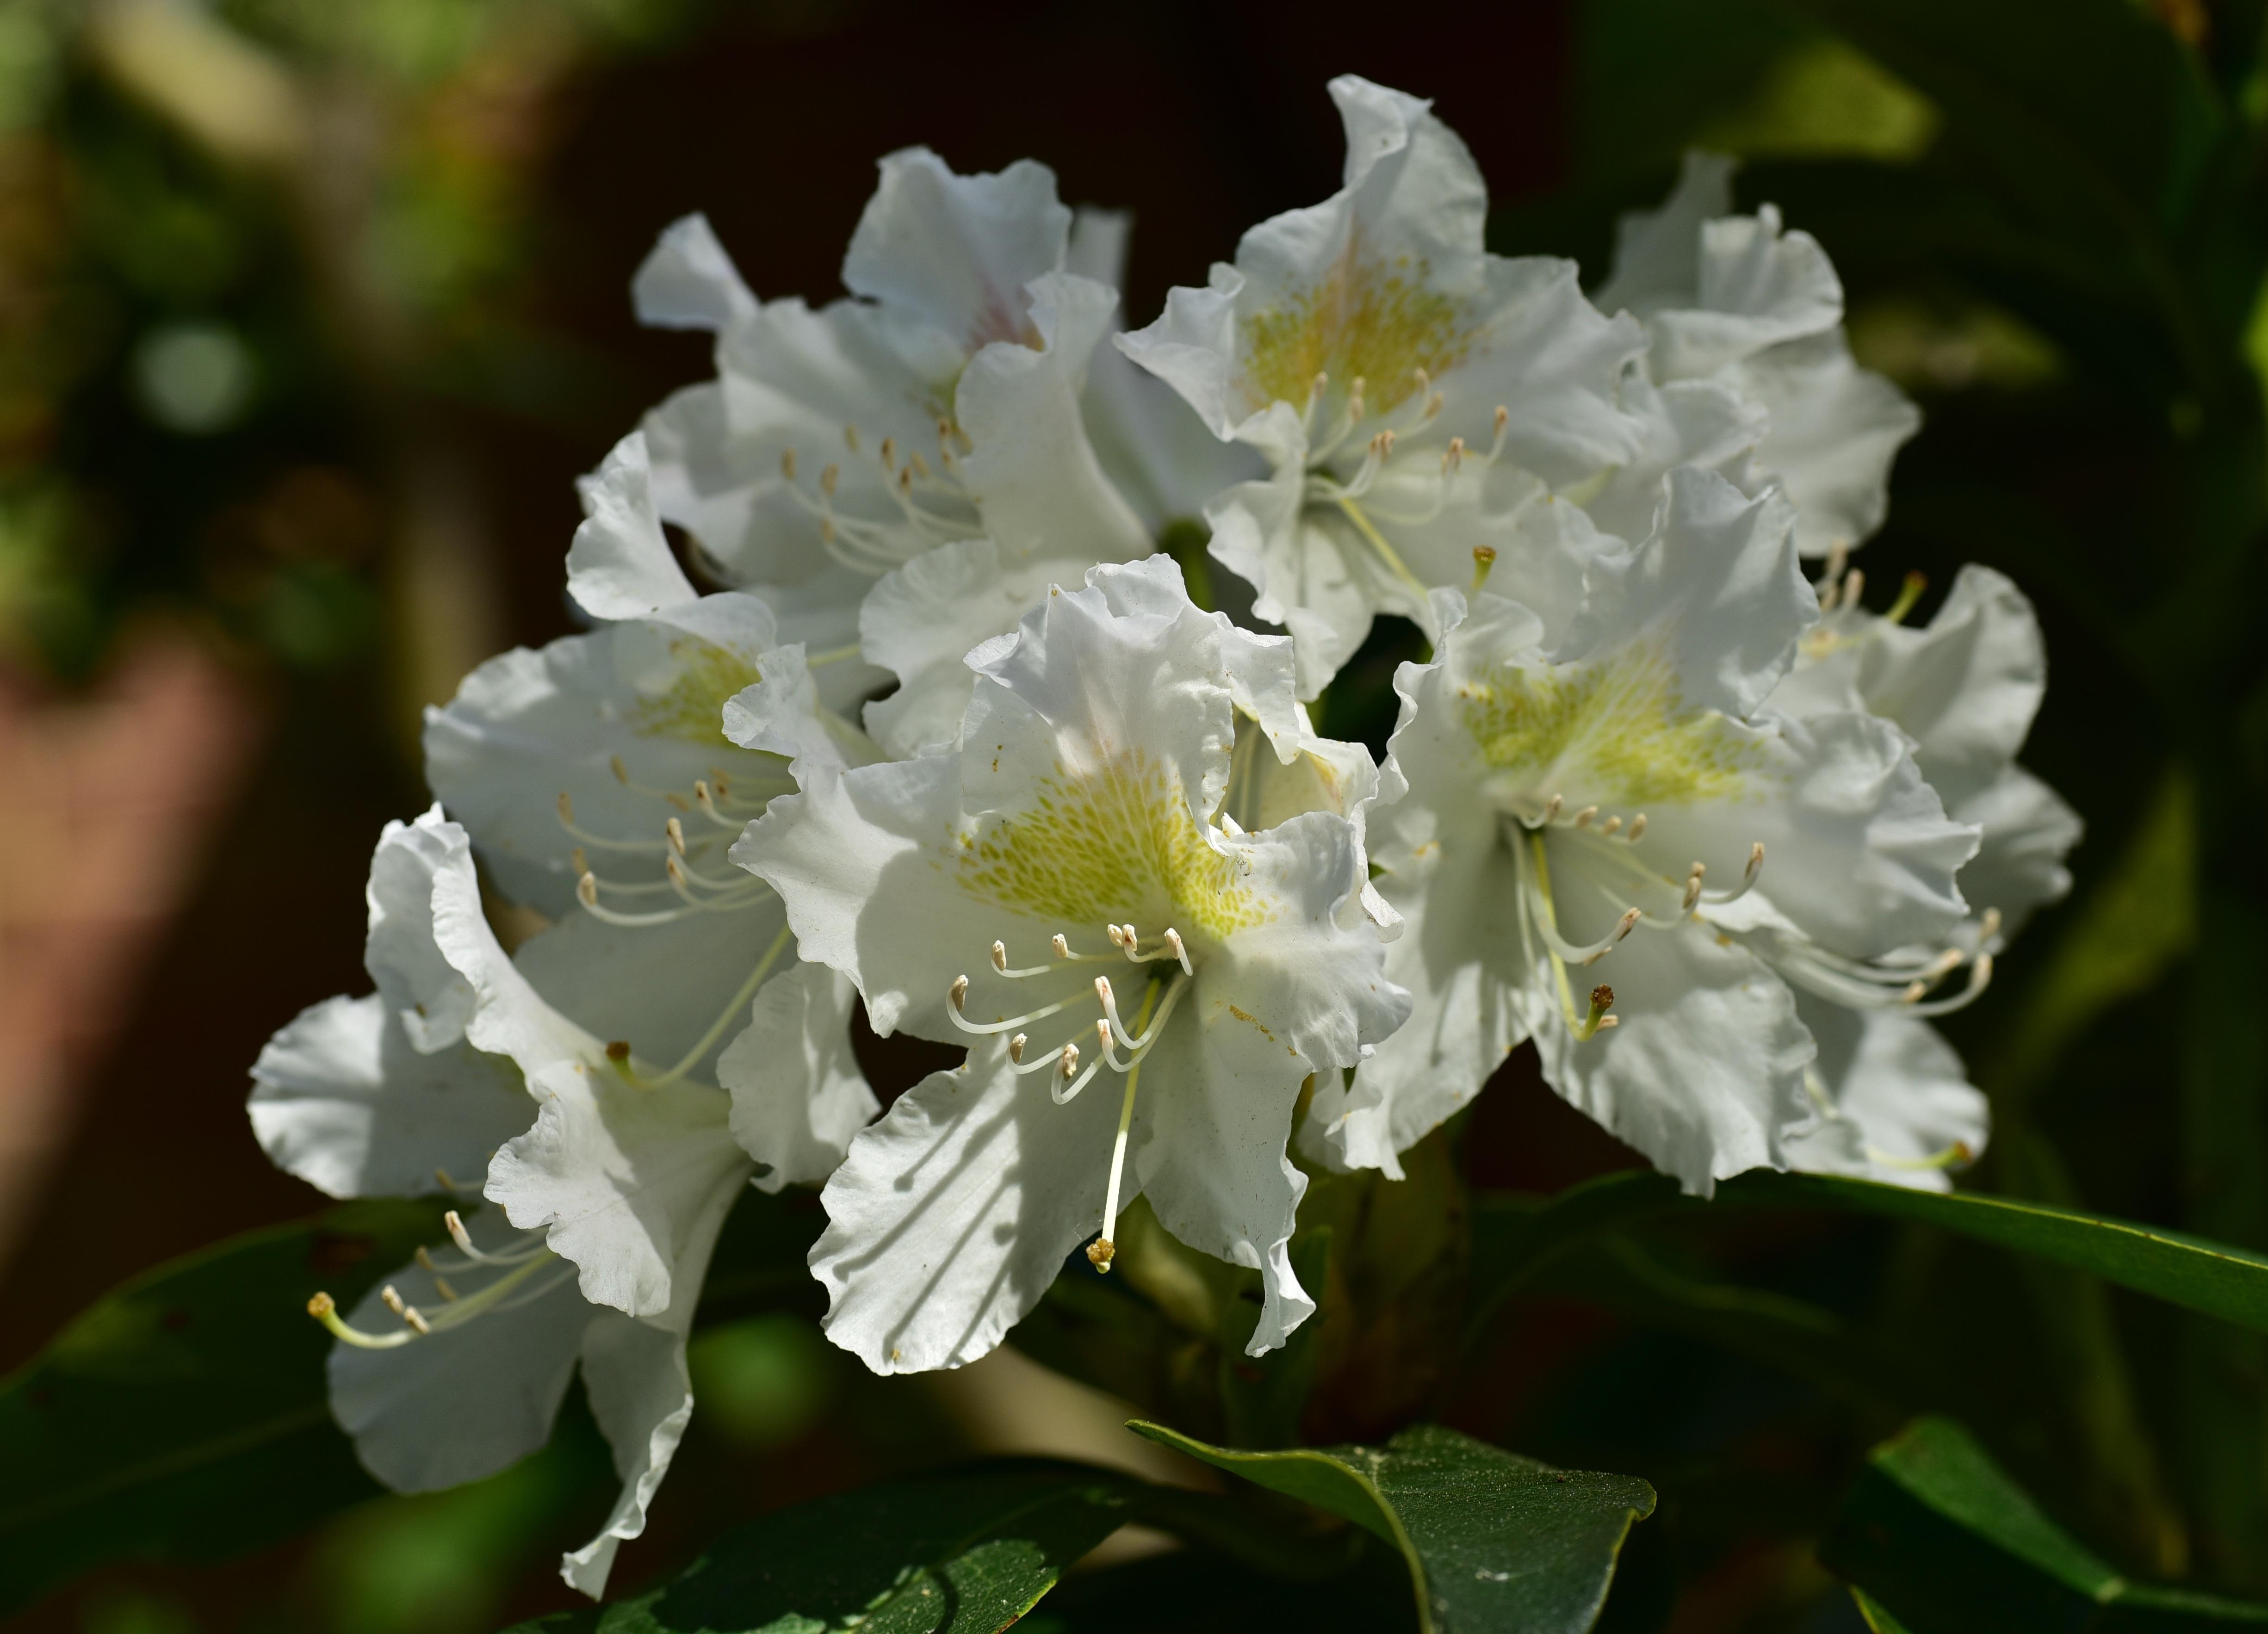 Free Images Branch Blossom White Sweet Flower Bush Spring